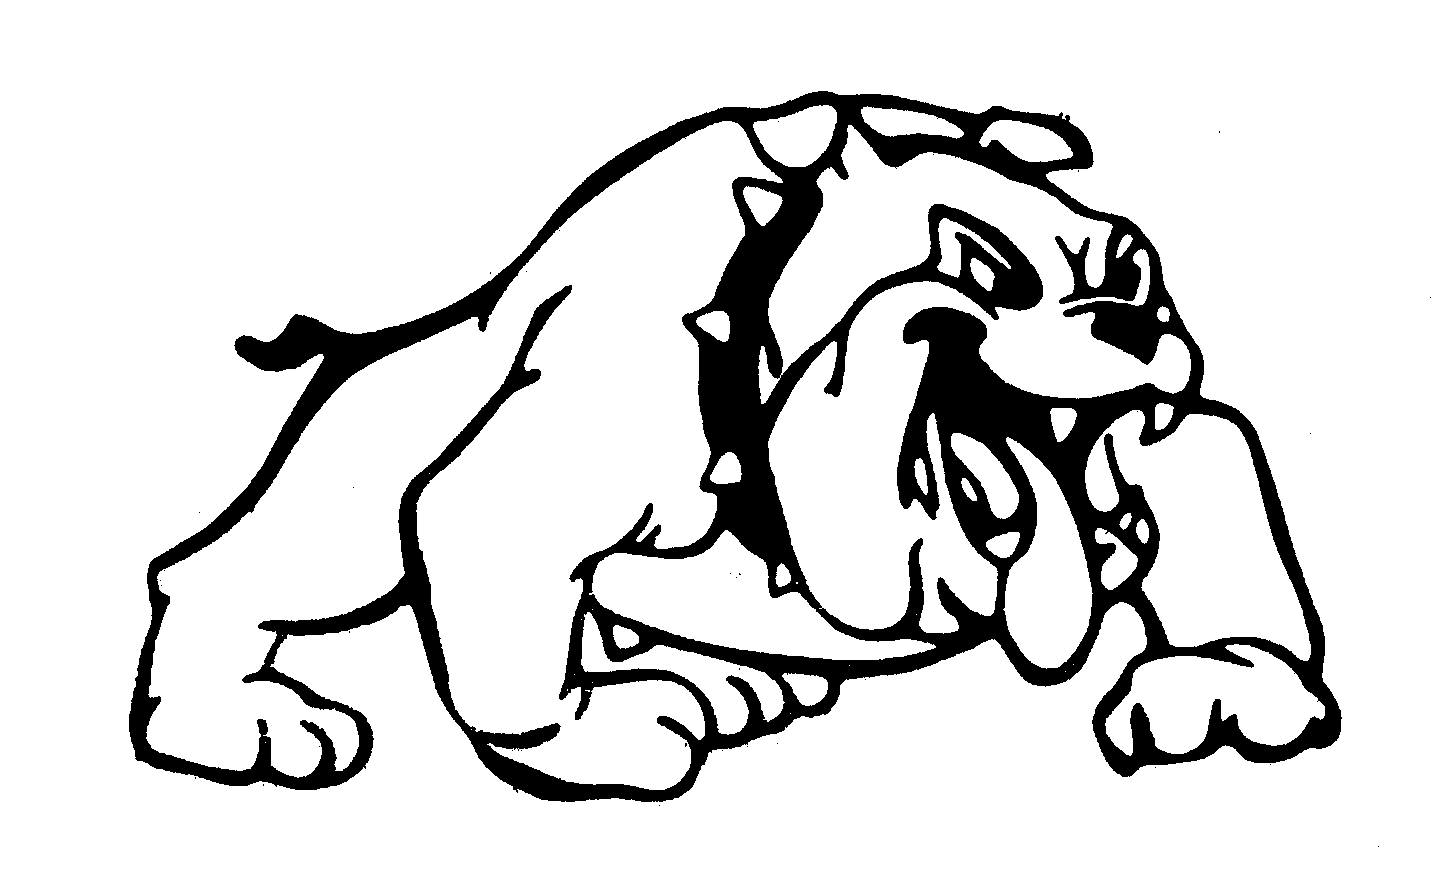 Bulldog clipart #17, Download drawings